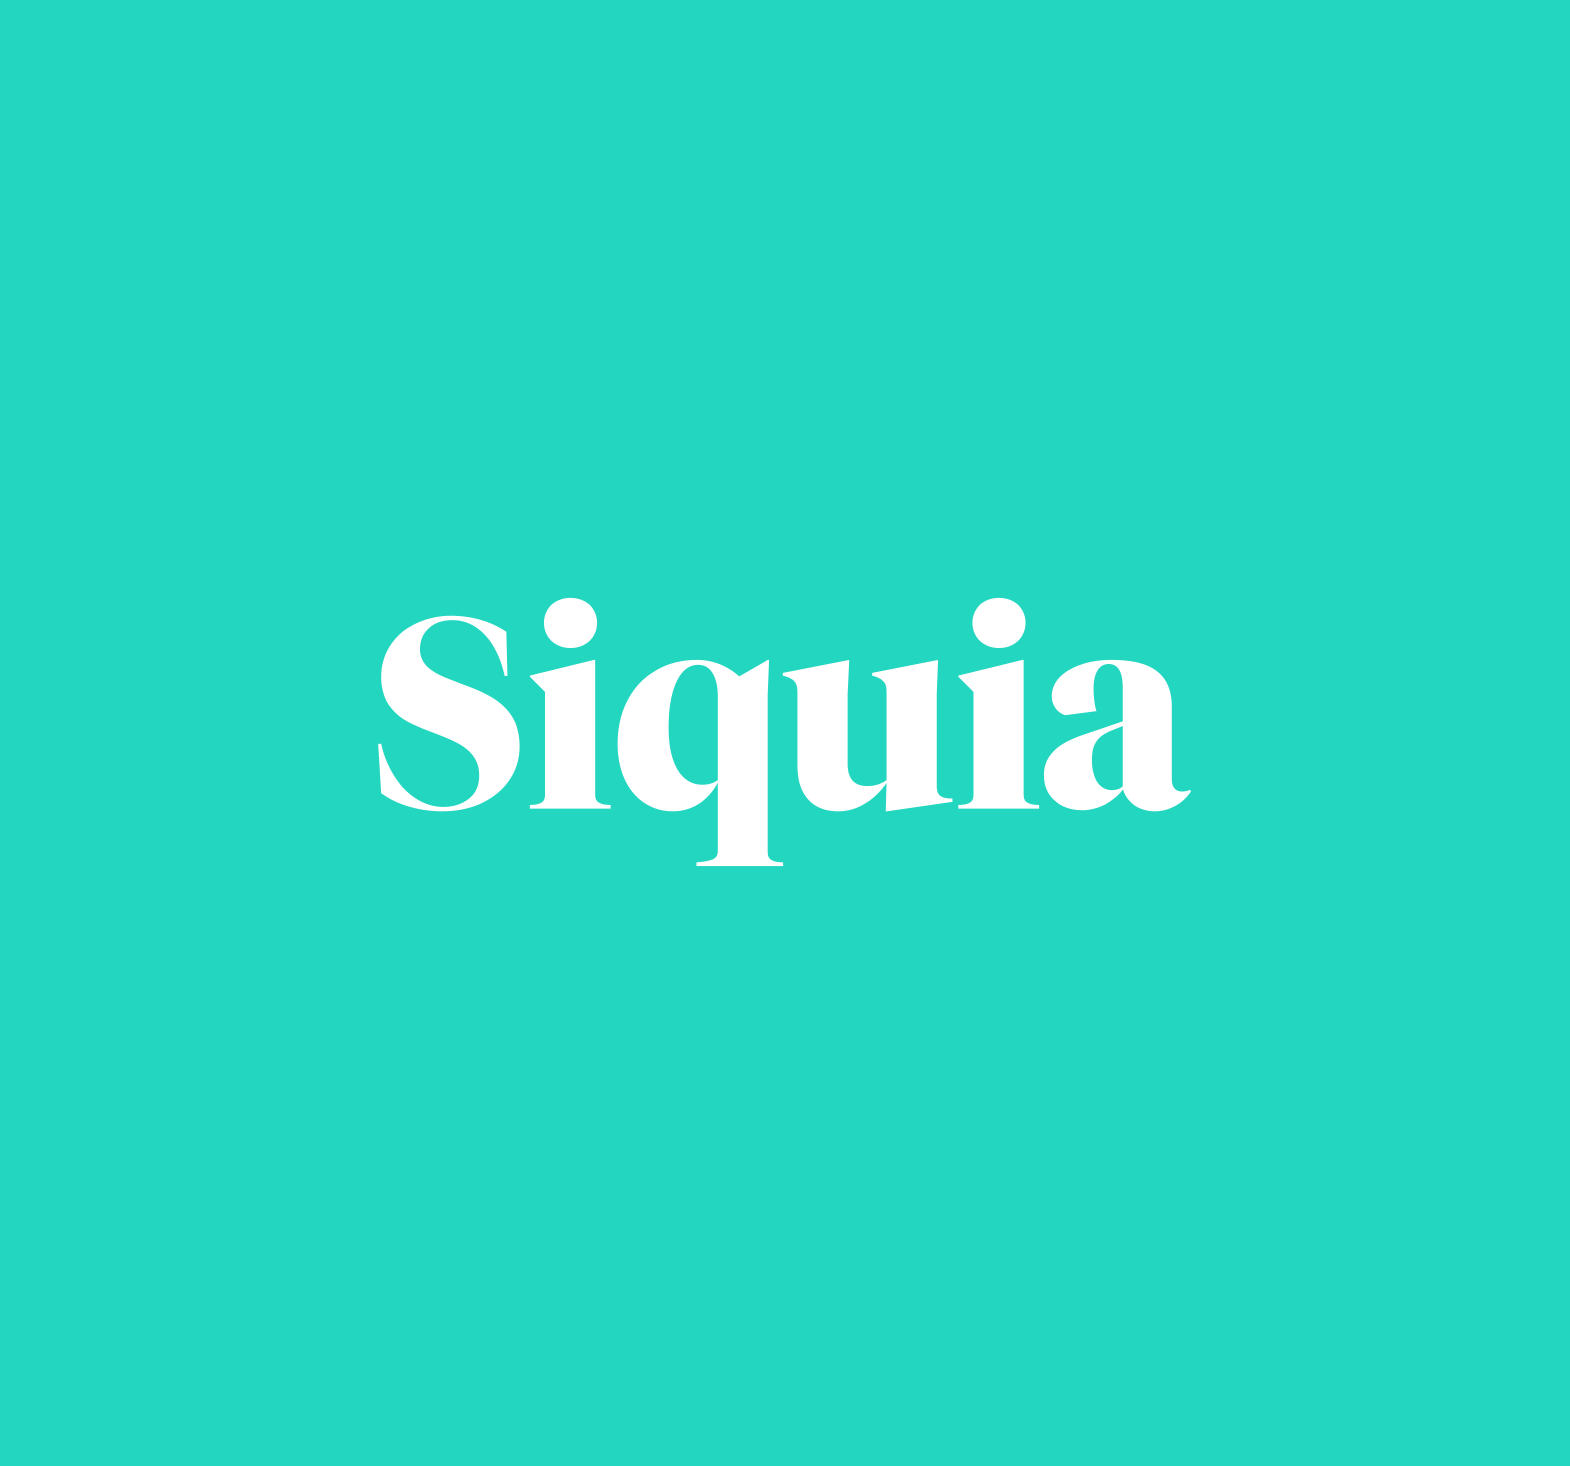 Imagen de Siquia